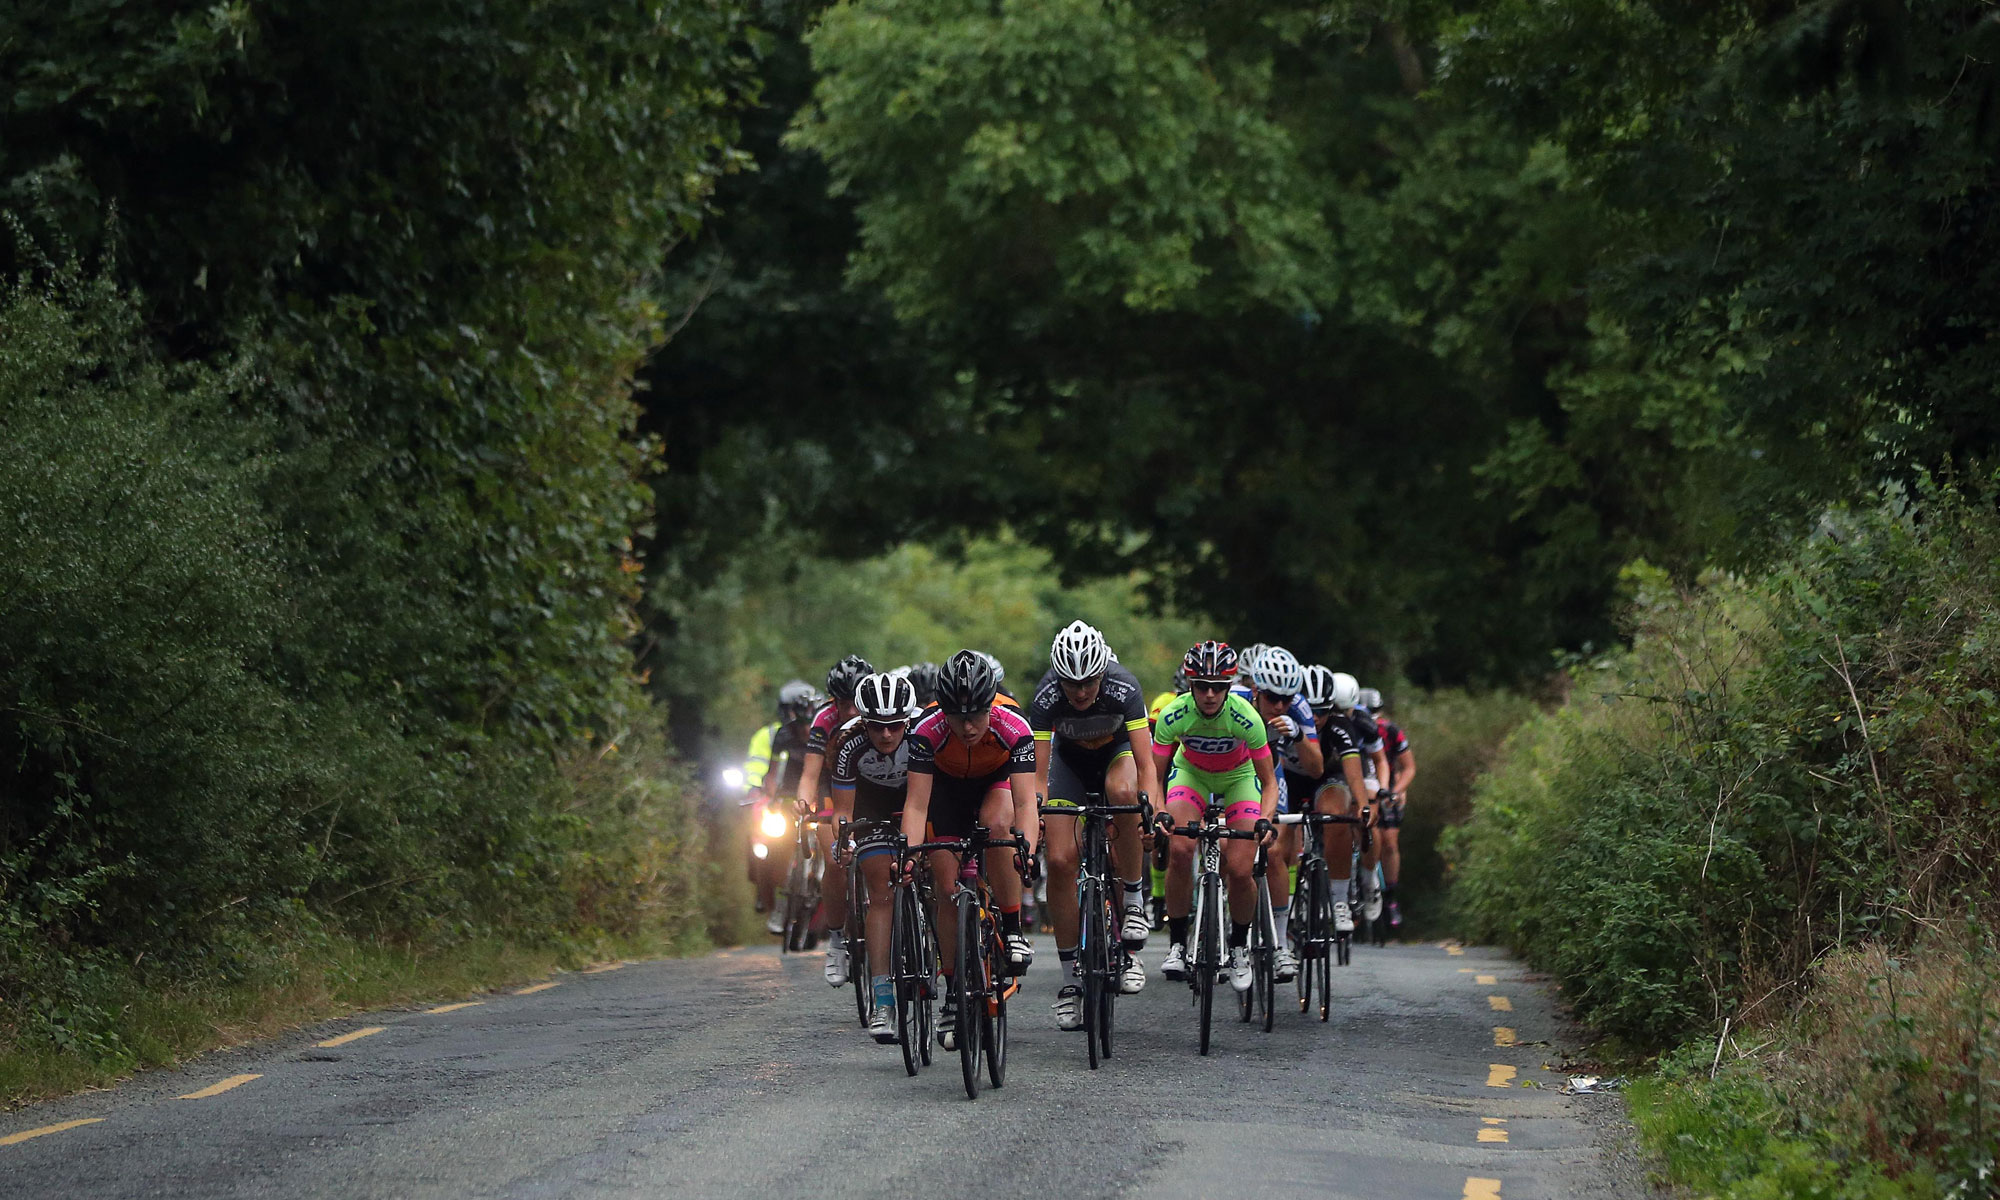 2016 Rás na mBan Stage 1, Kilkenny